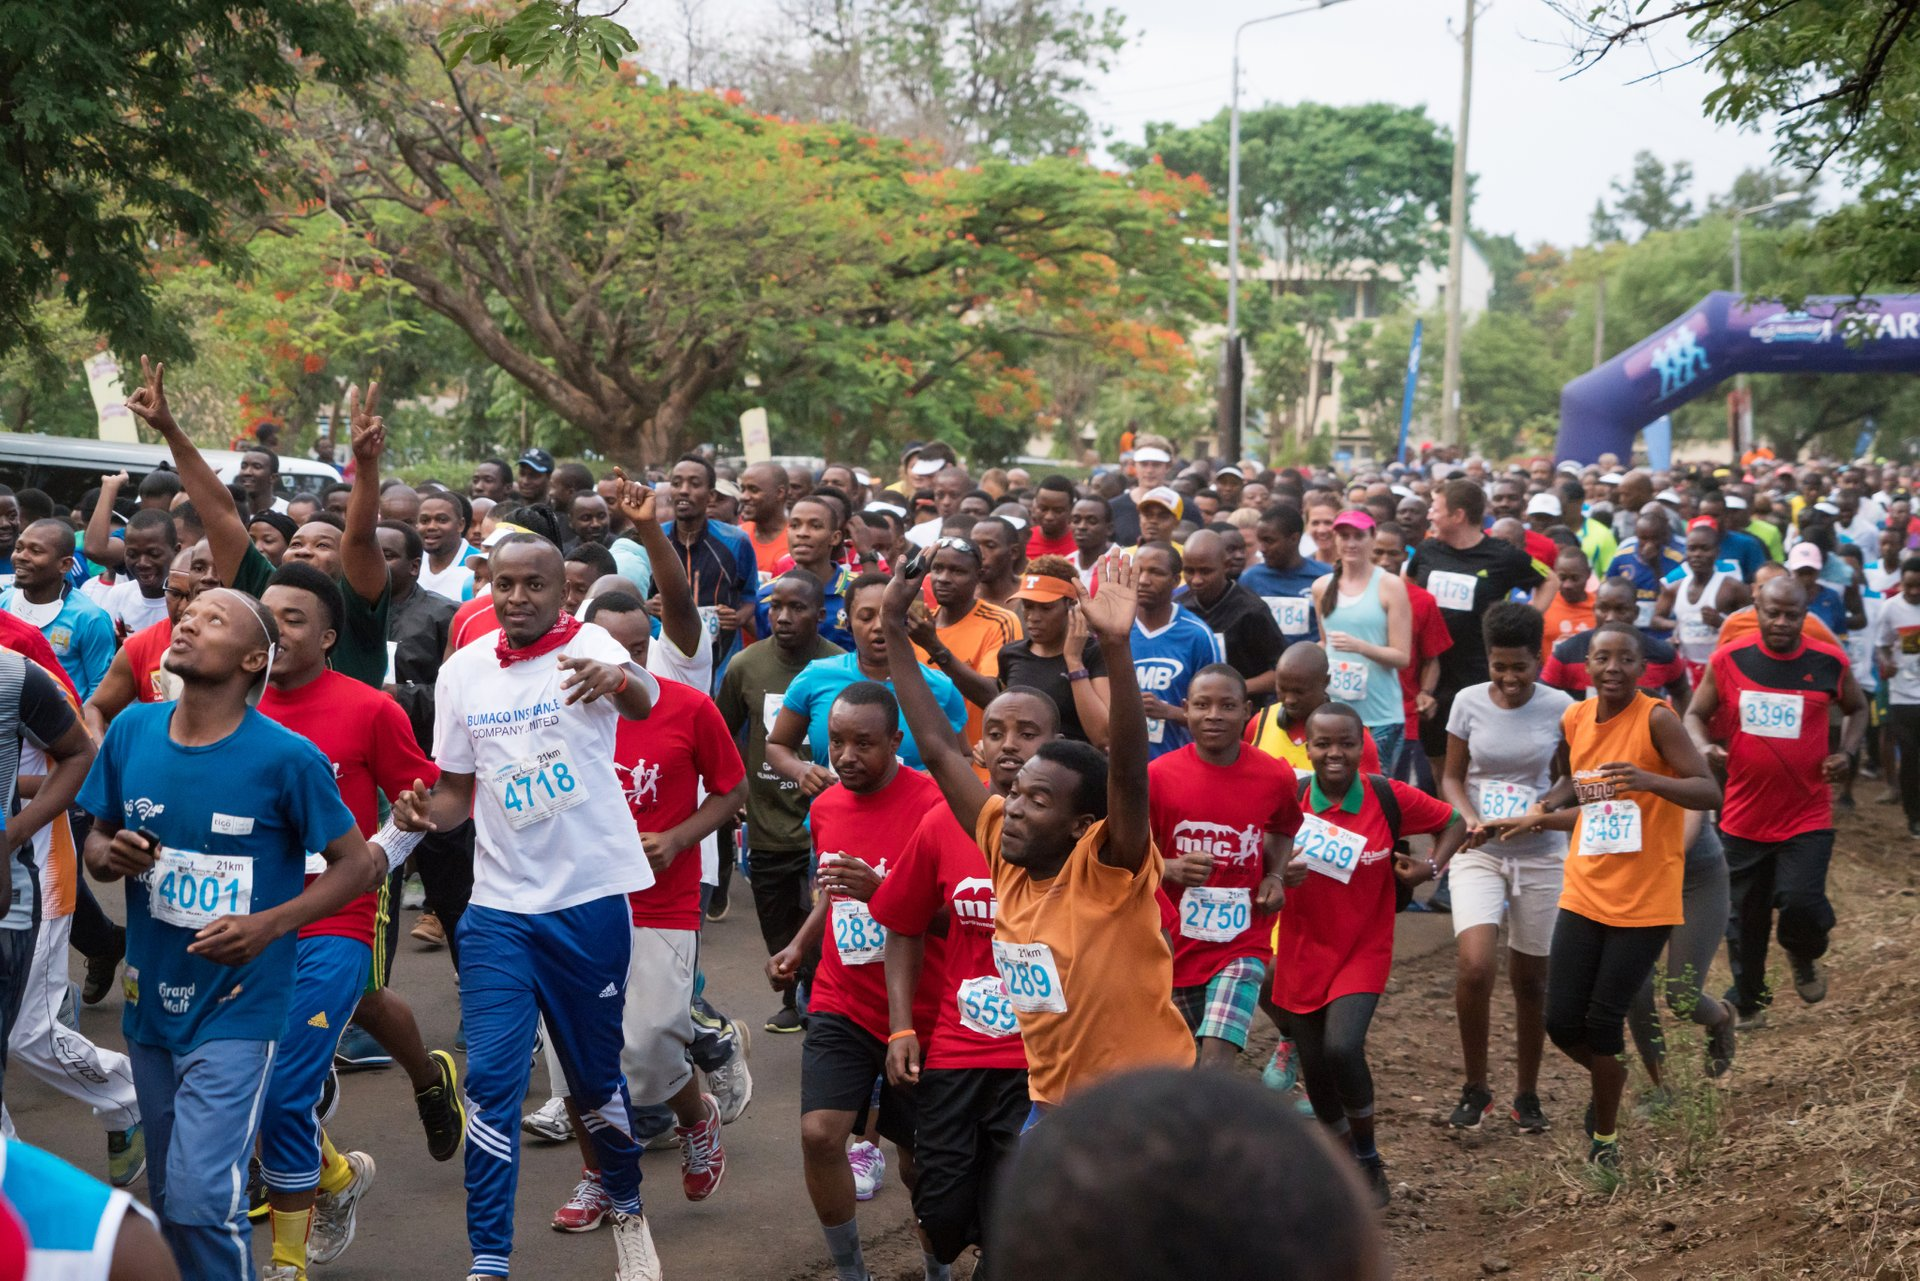 Kilimanjaro Marathon in Tanzania - Best Season 2020